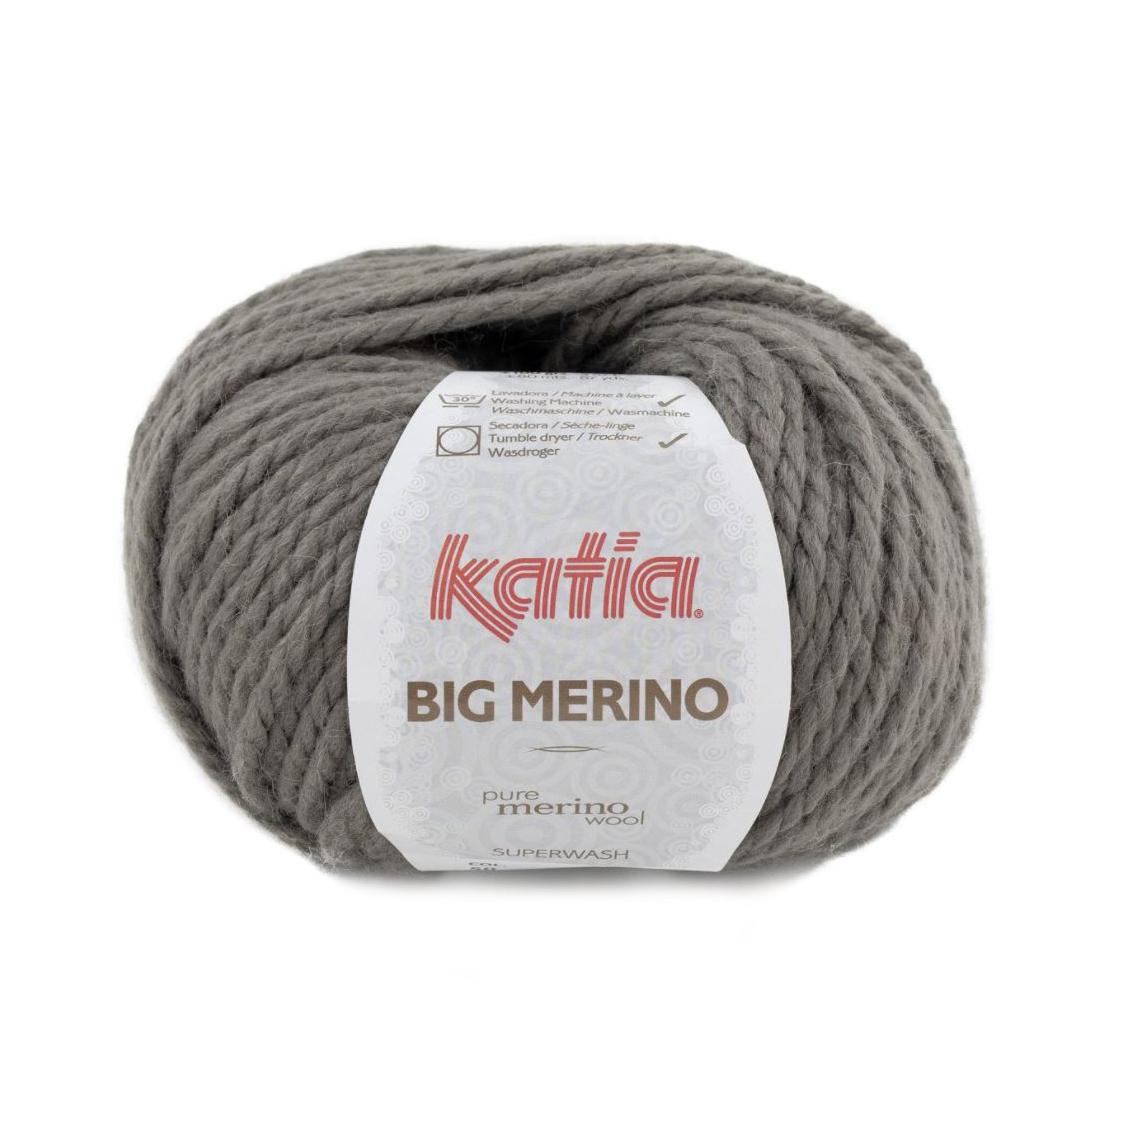 Big Merino 50 musegrå